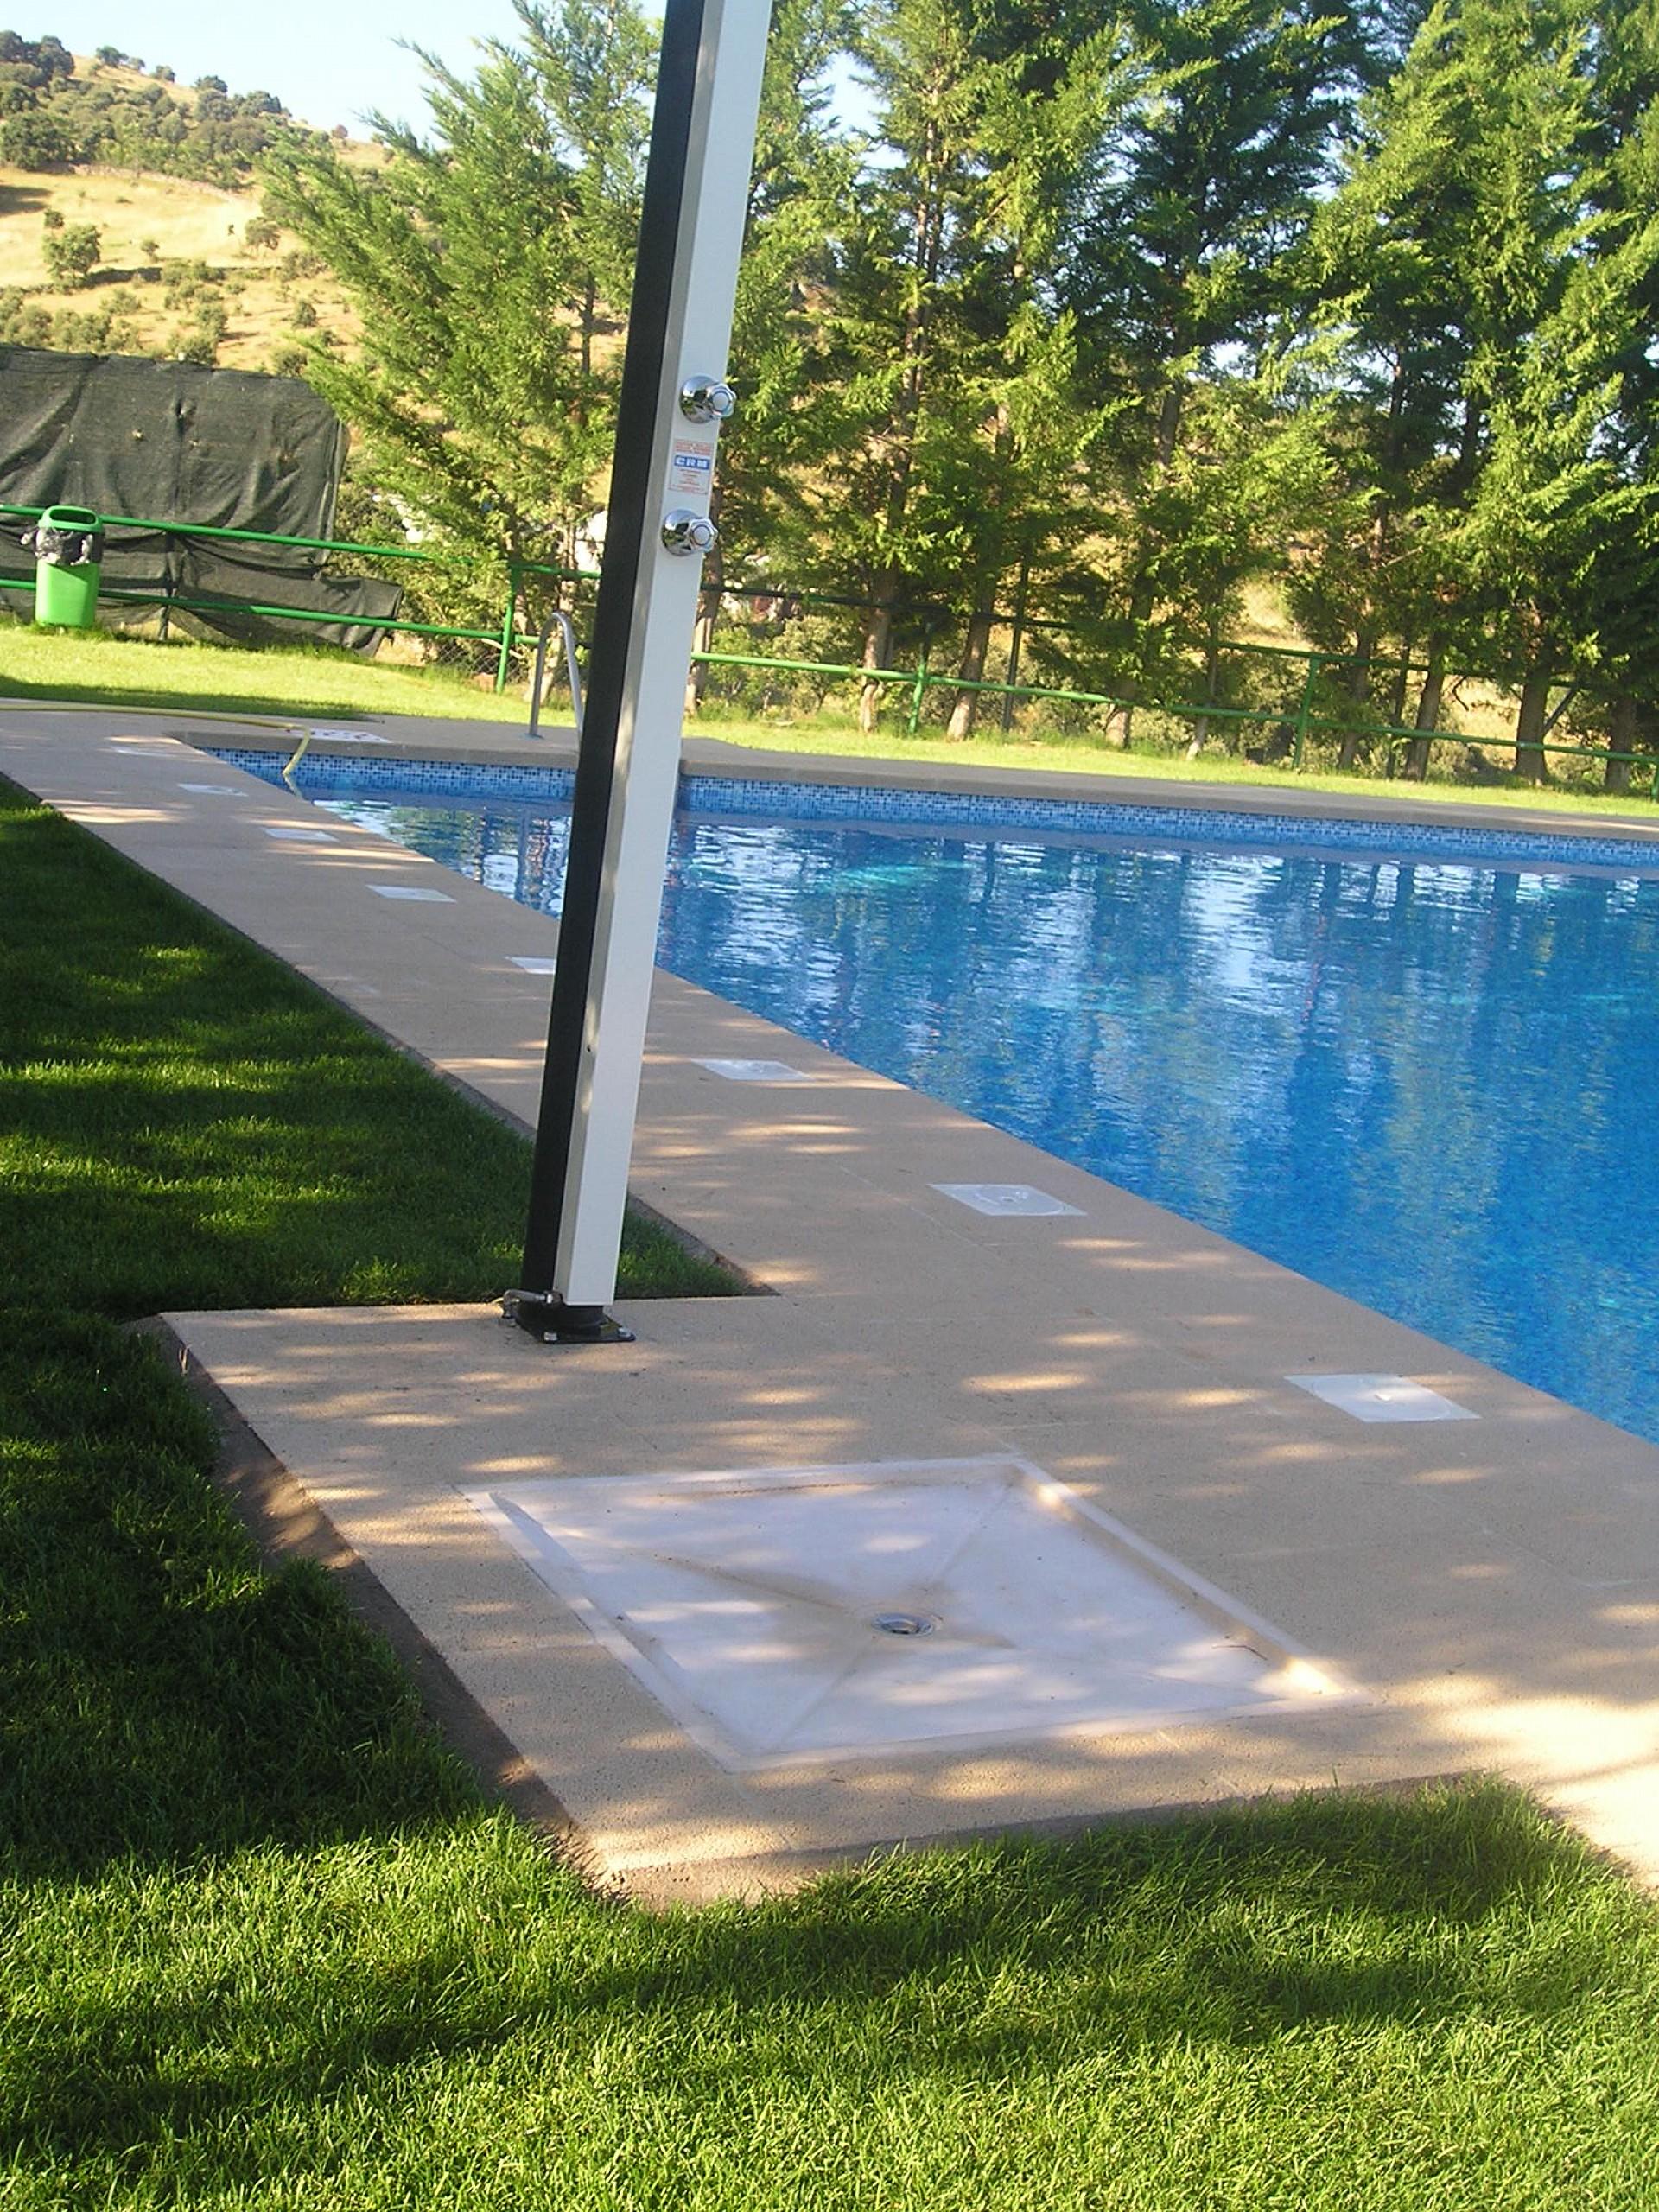 Piscinas reparaci n piscinas avila for Reparacion piscinas